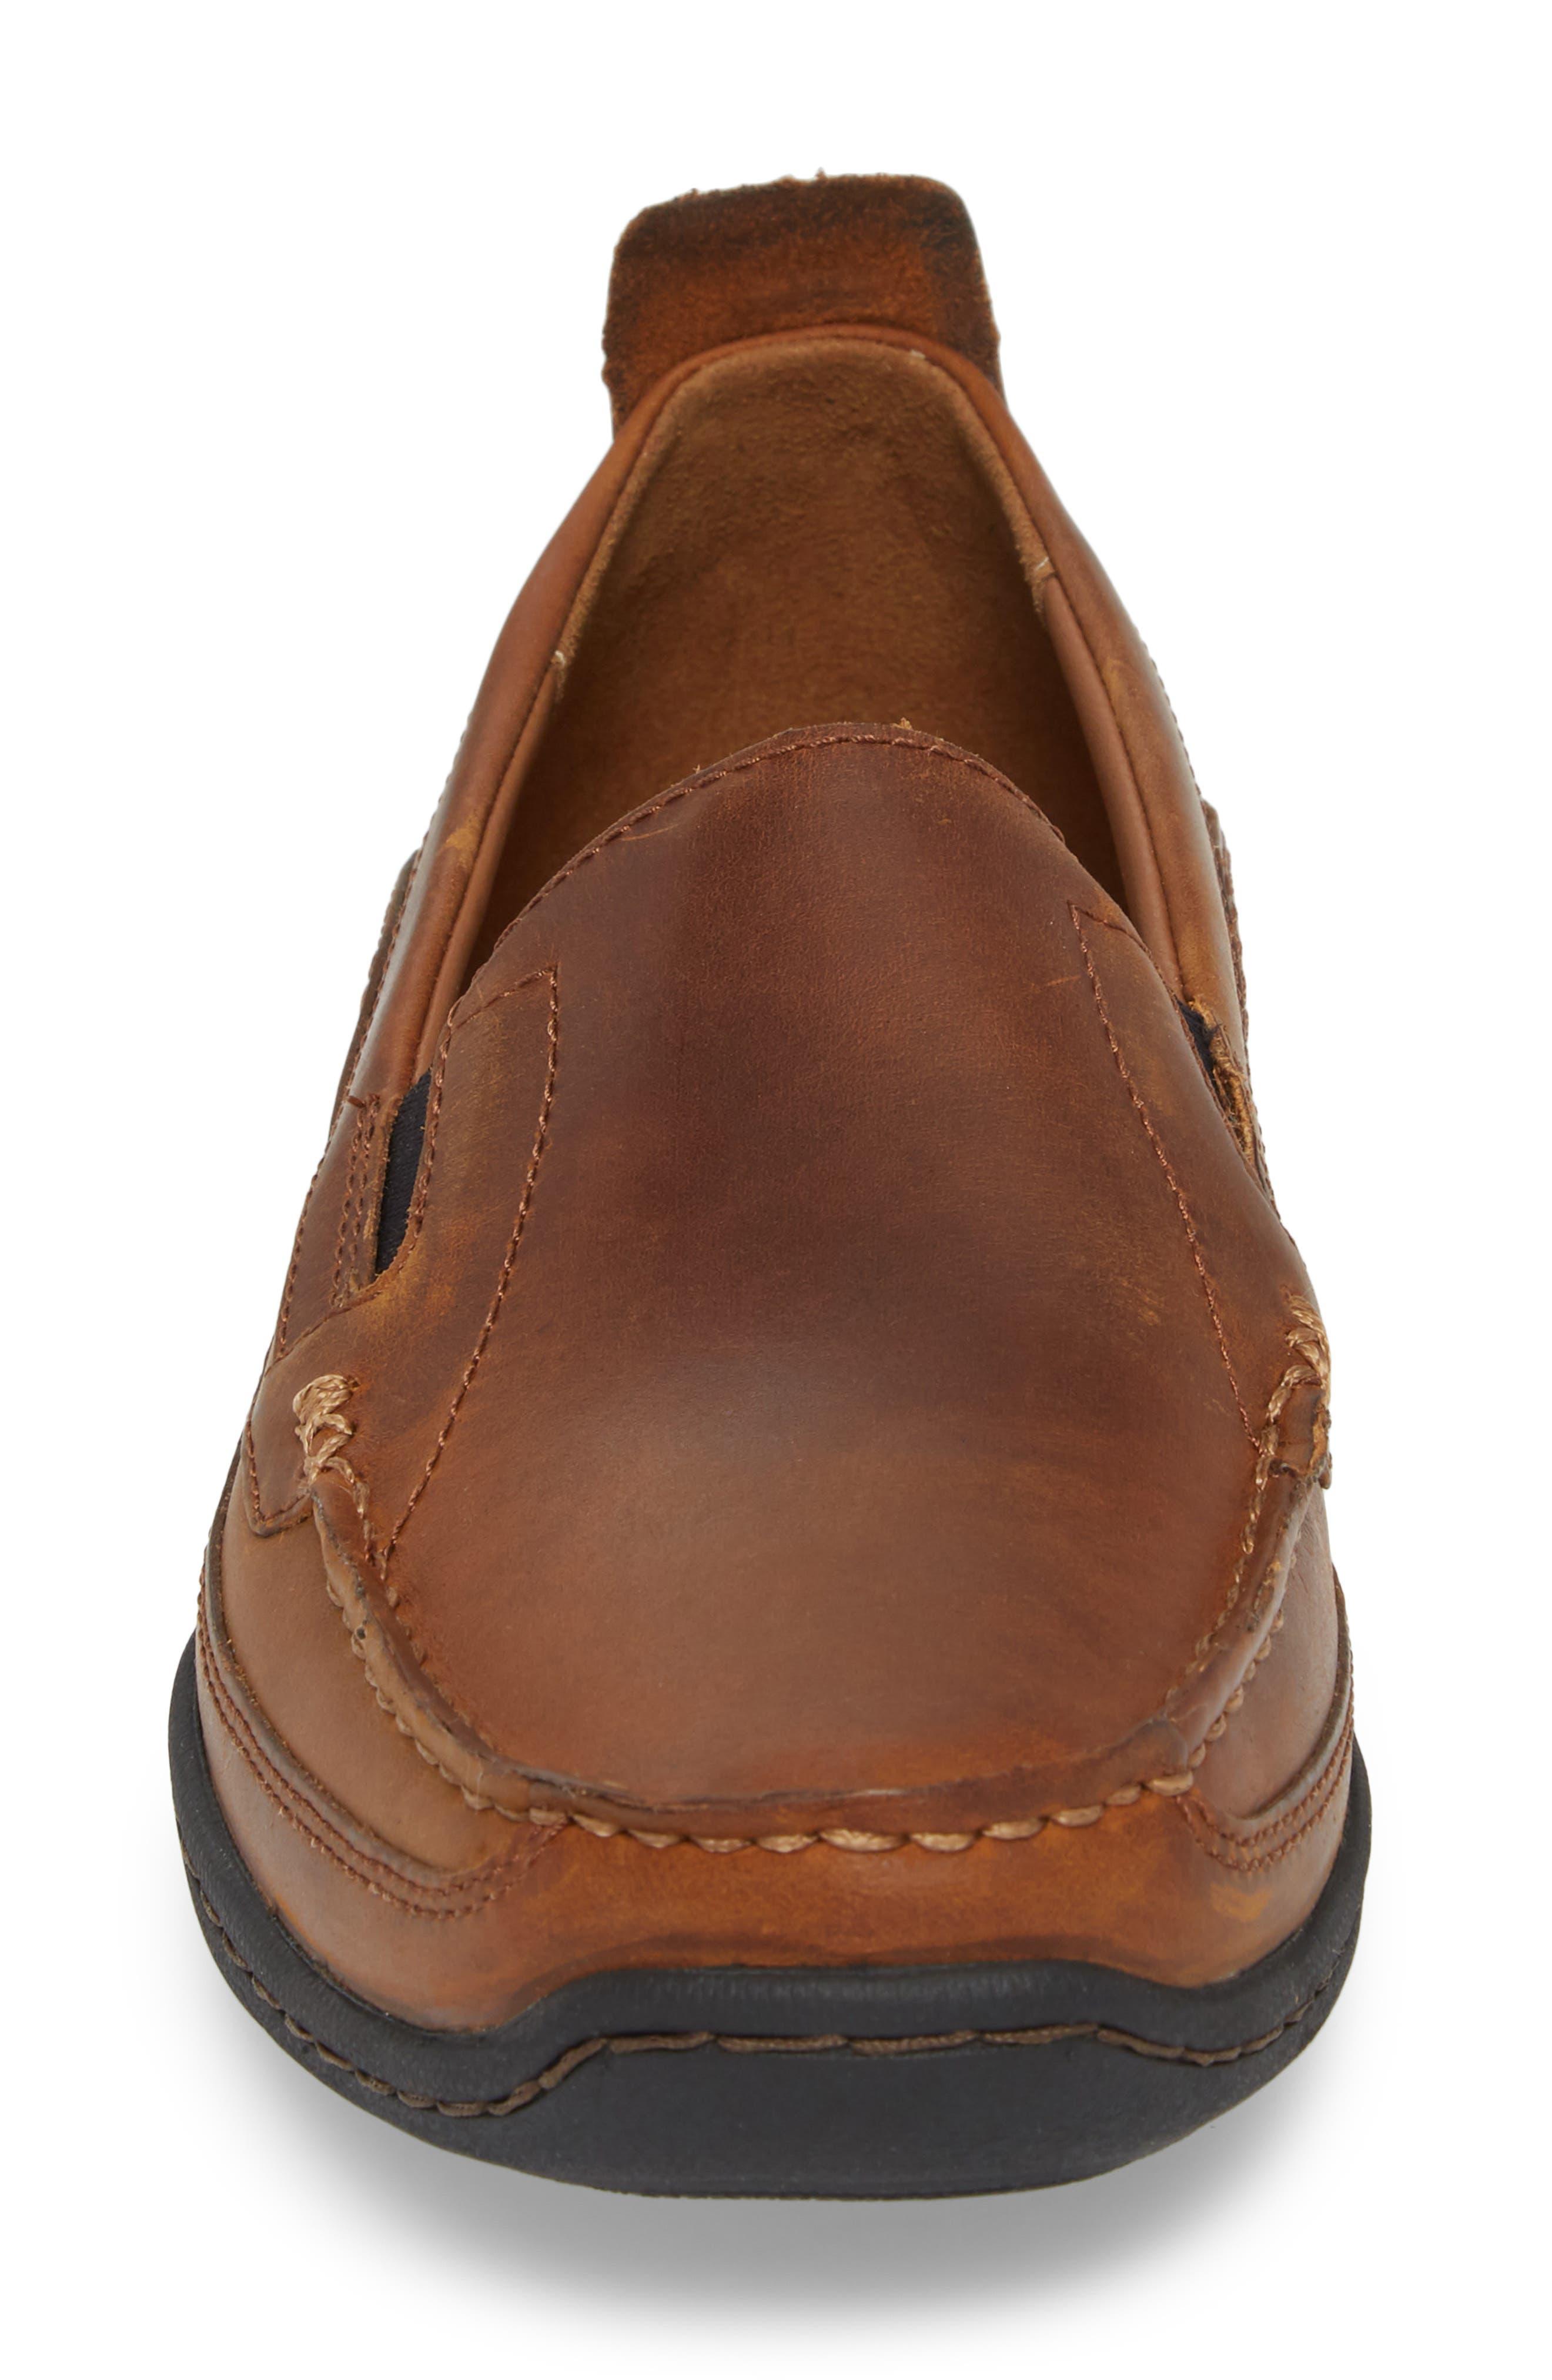 Sandspoint Venetian Loafer,                             Alternate thumbnail 4, color,                             Tan Old Harness